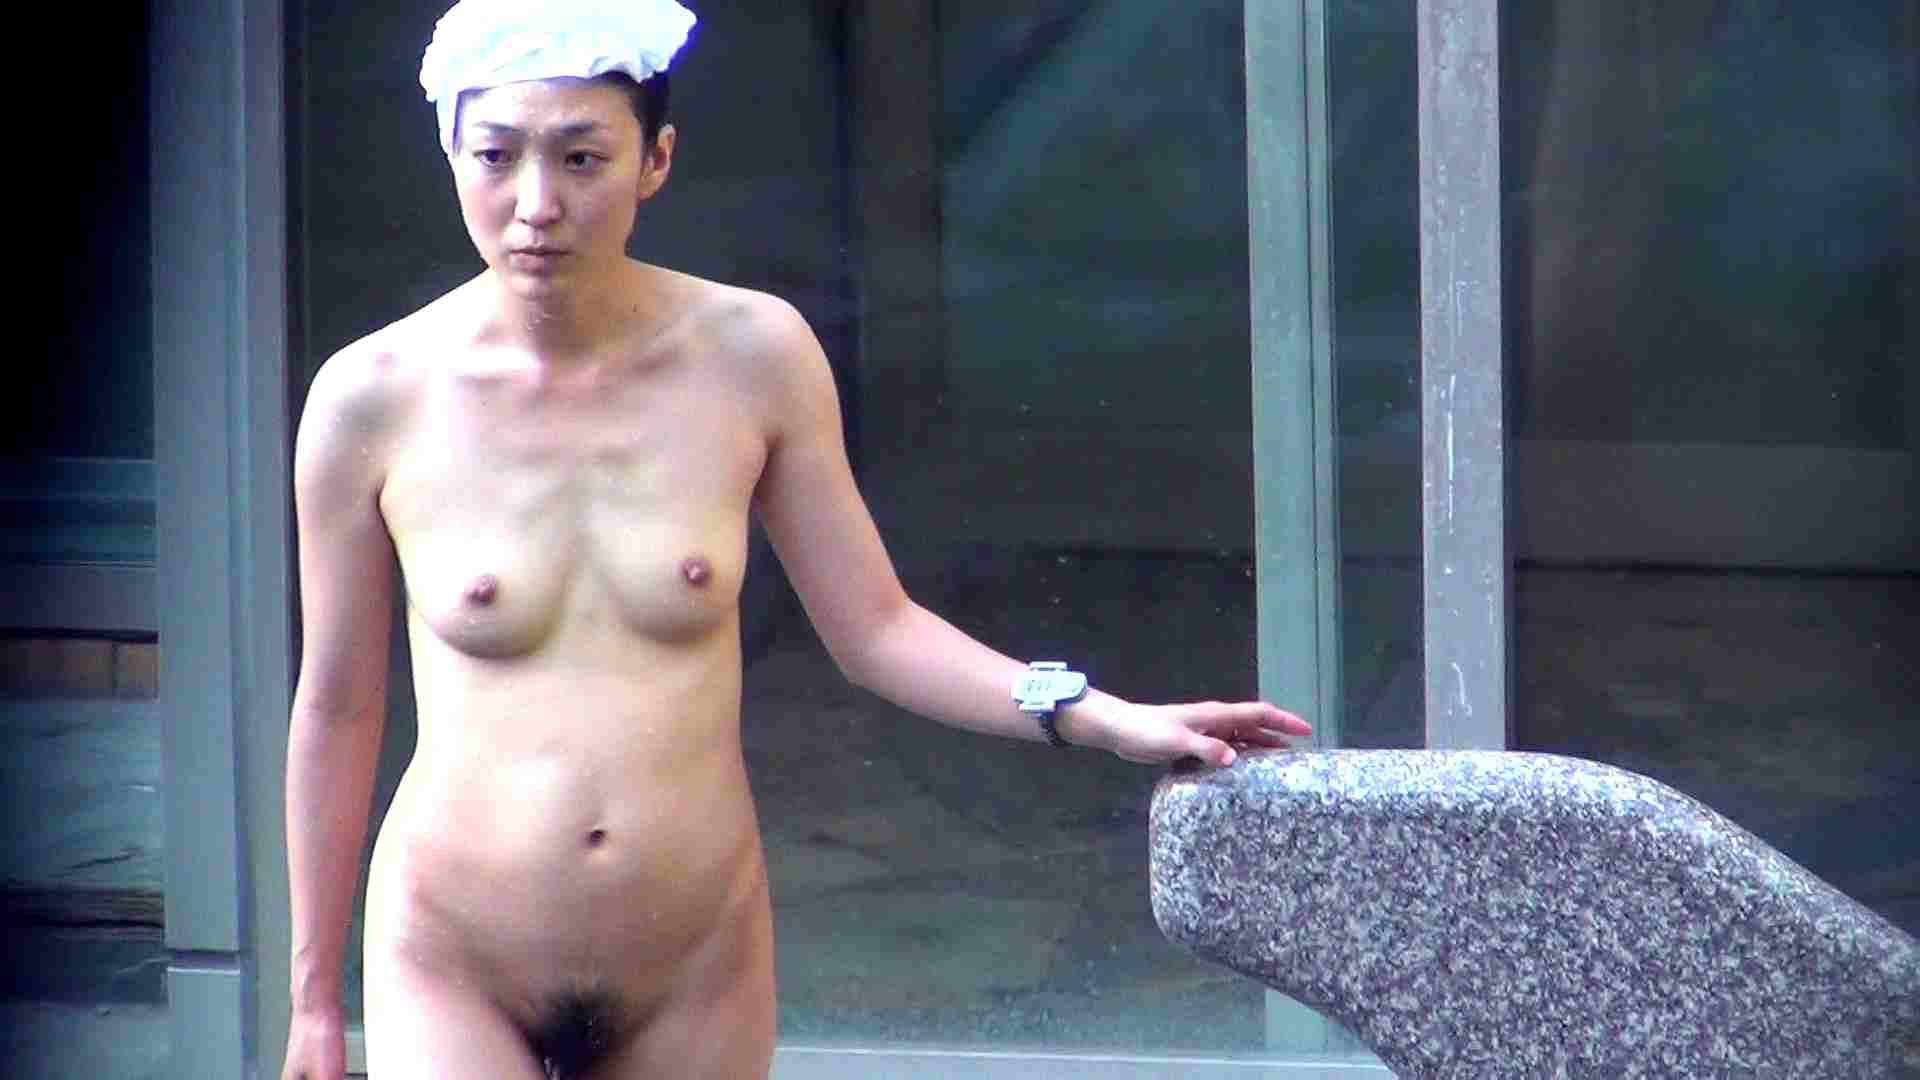 Vol.60 細身美女の股間から垂れているタコ糸 美肌 SEX無修正画像 74画像 57